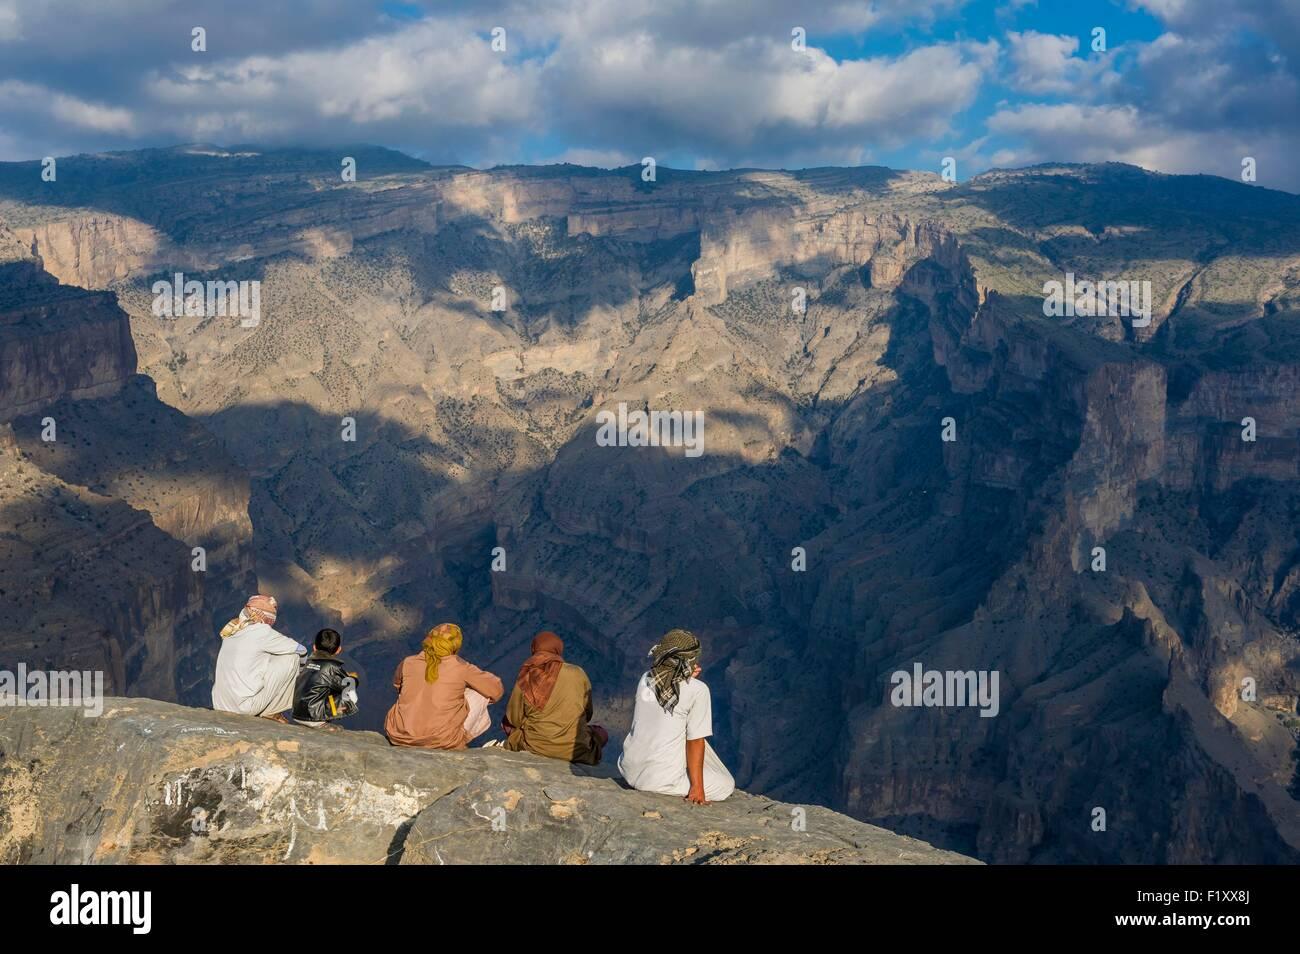 Oman, le Djebel Shams, Oman Grand Canyon Photo Stock